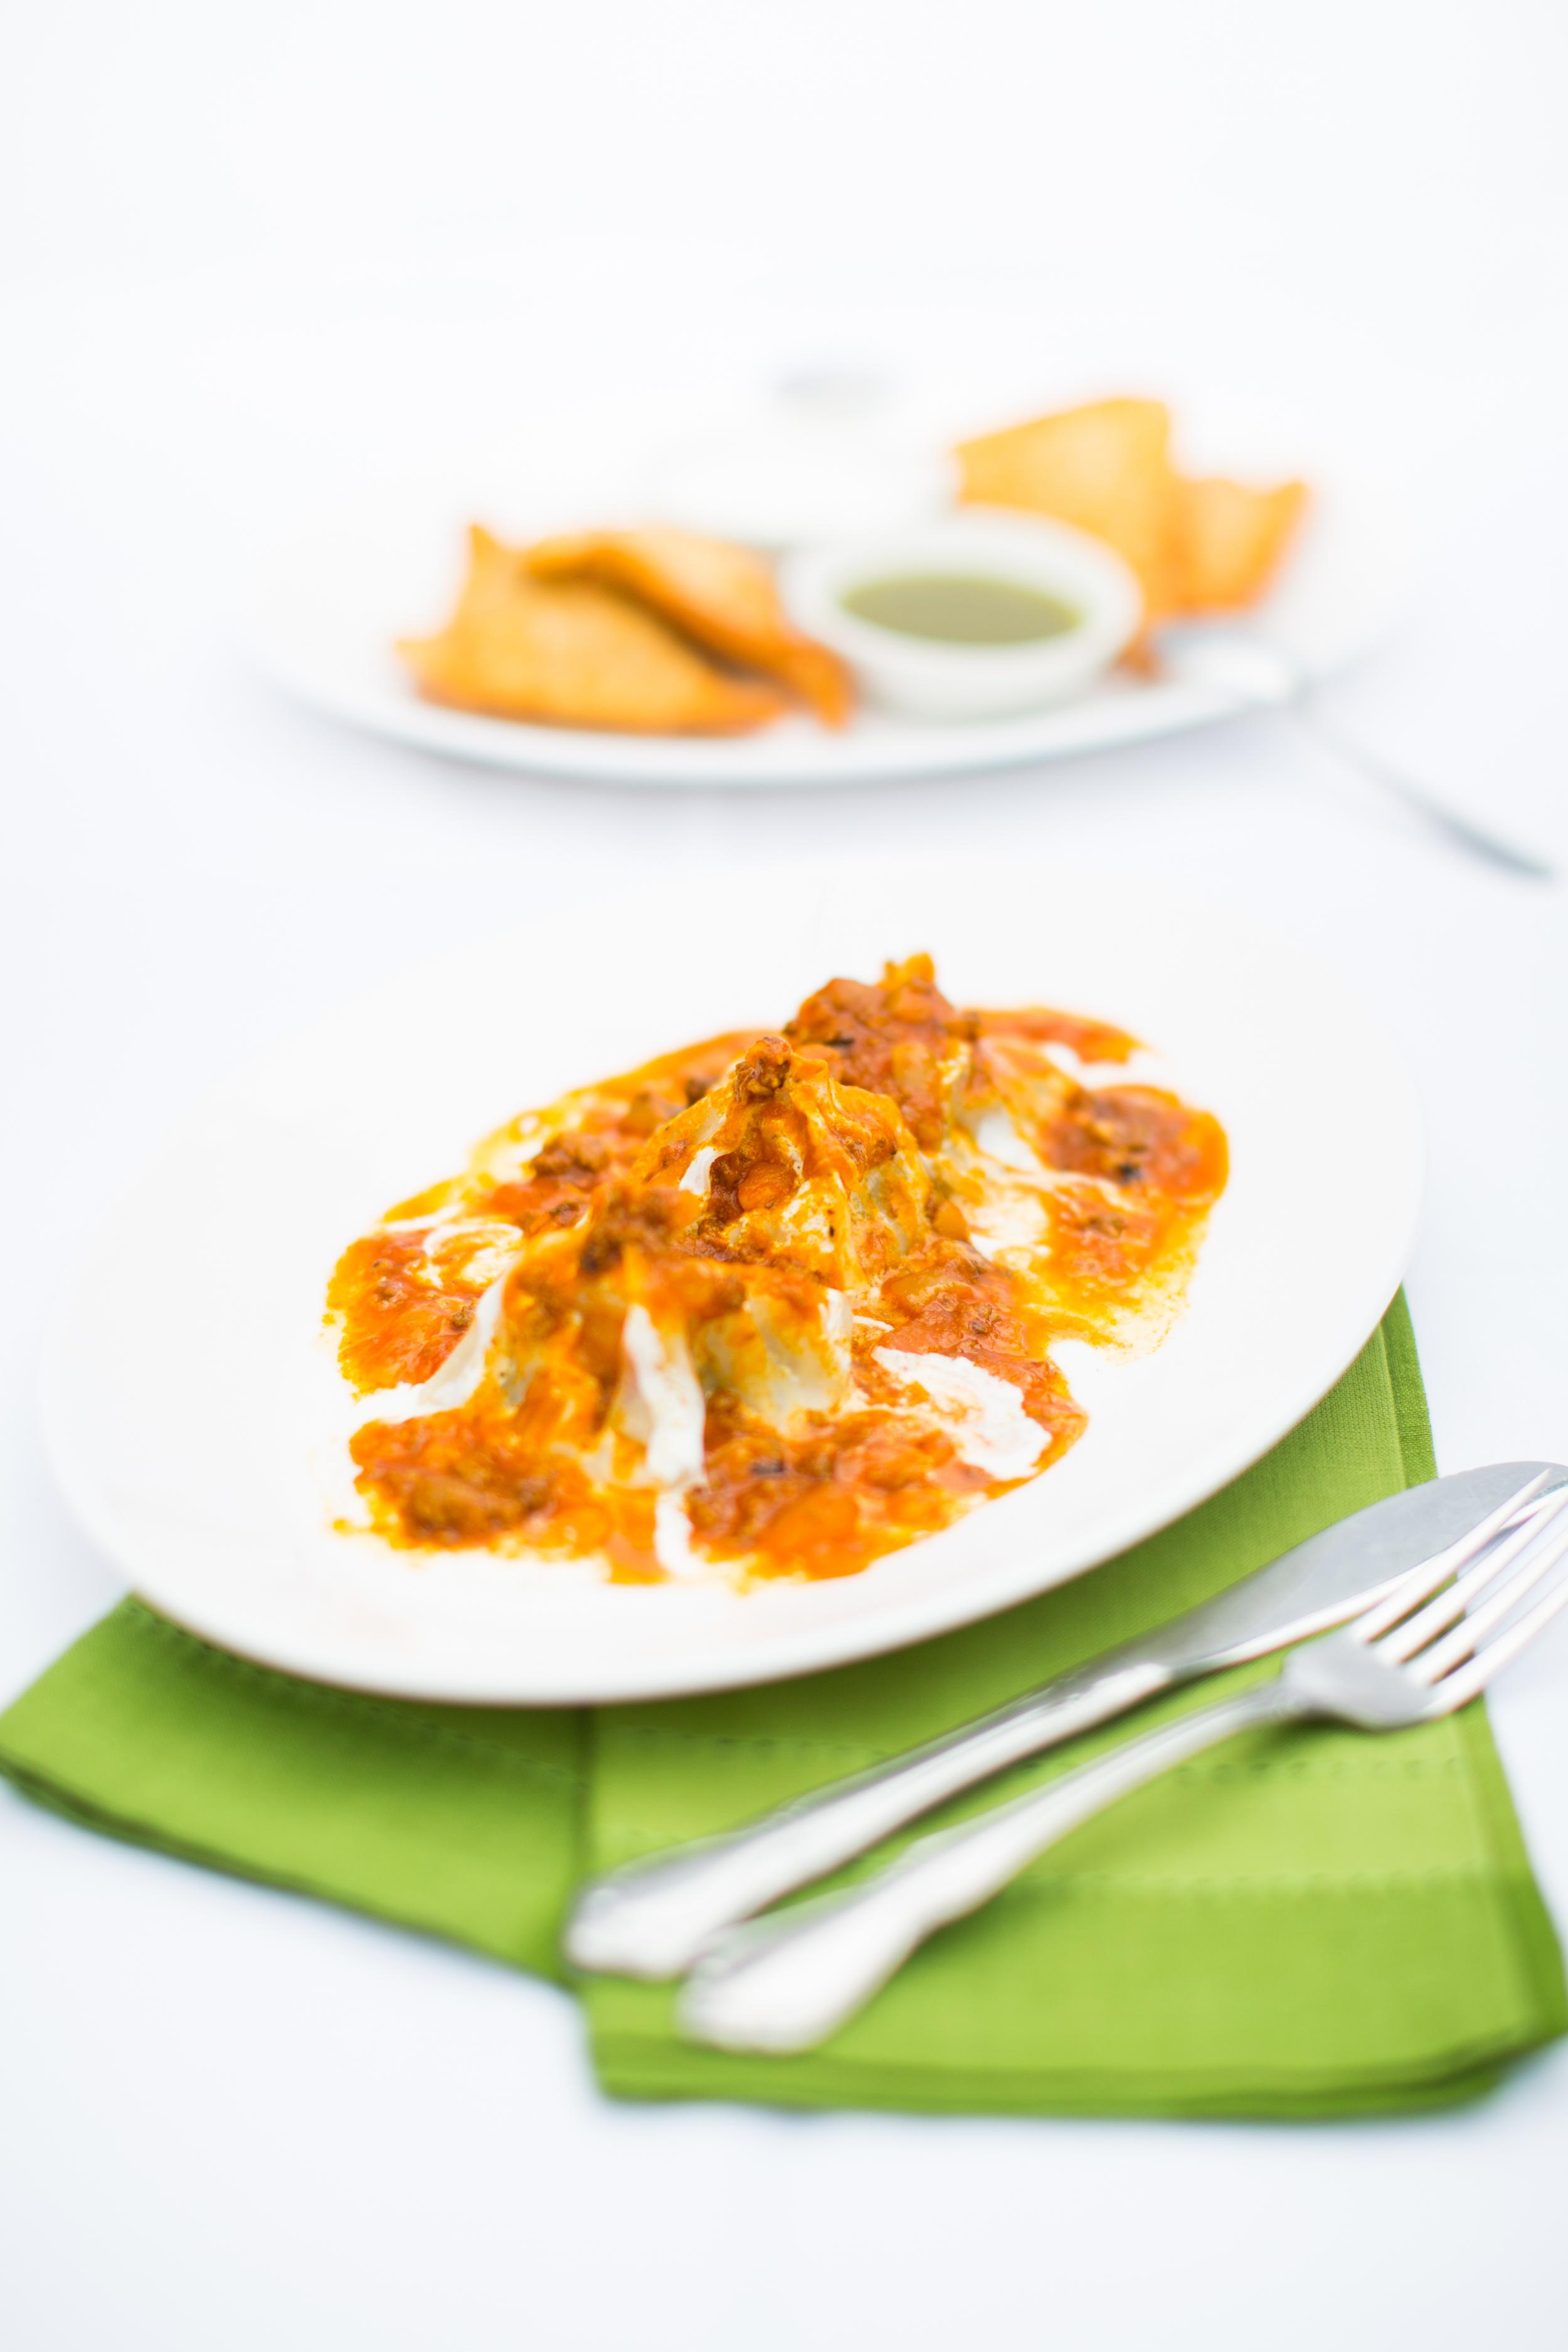 Panjshir-Cam-2-vertical-1-nabu-food-photography.jpg